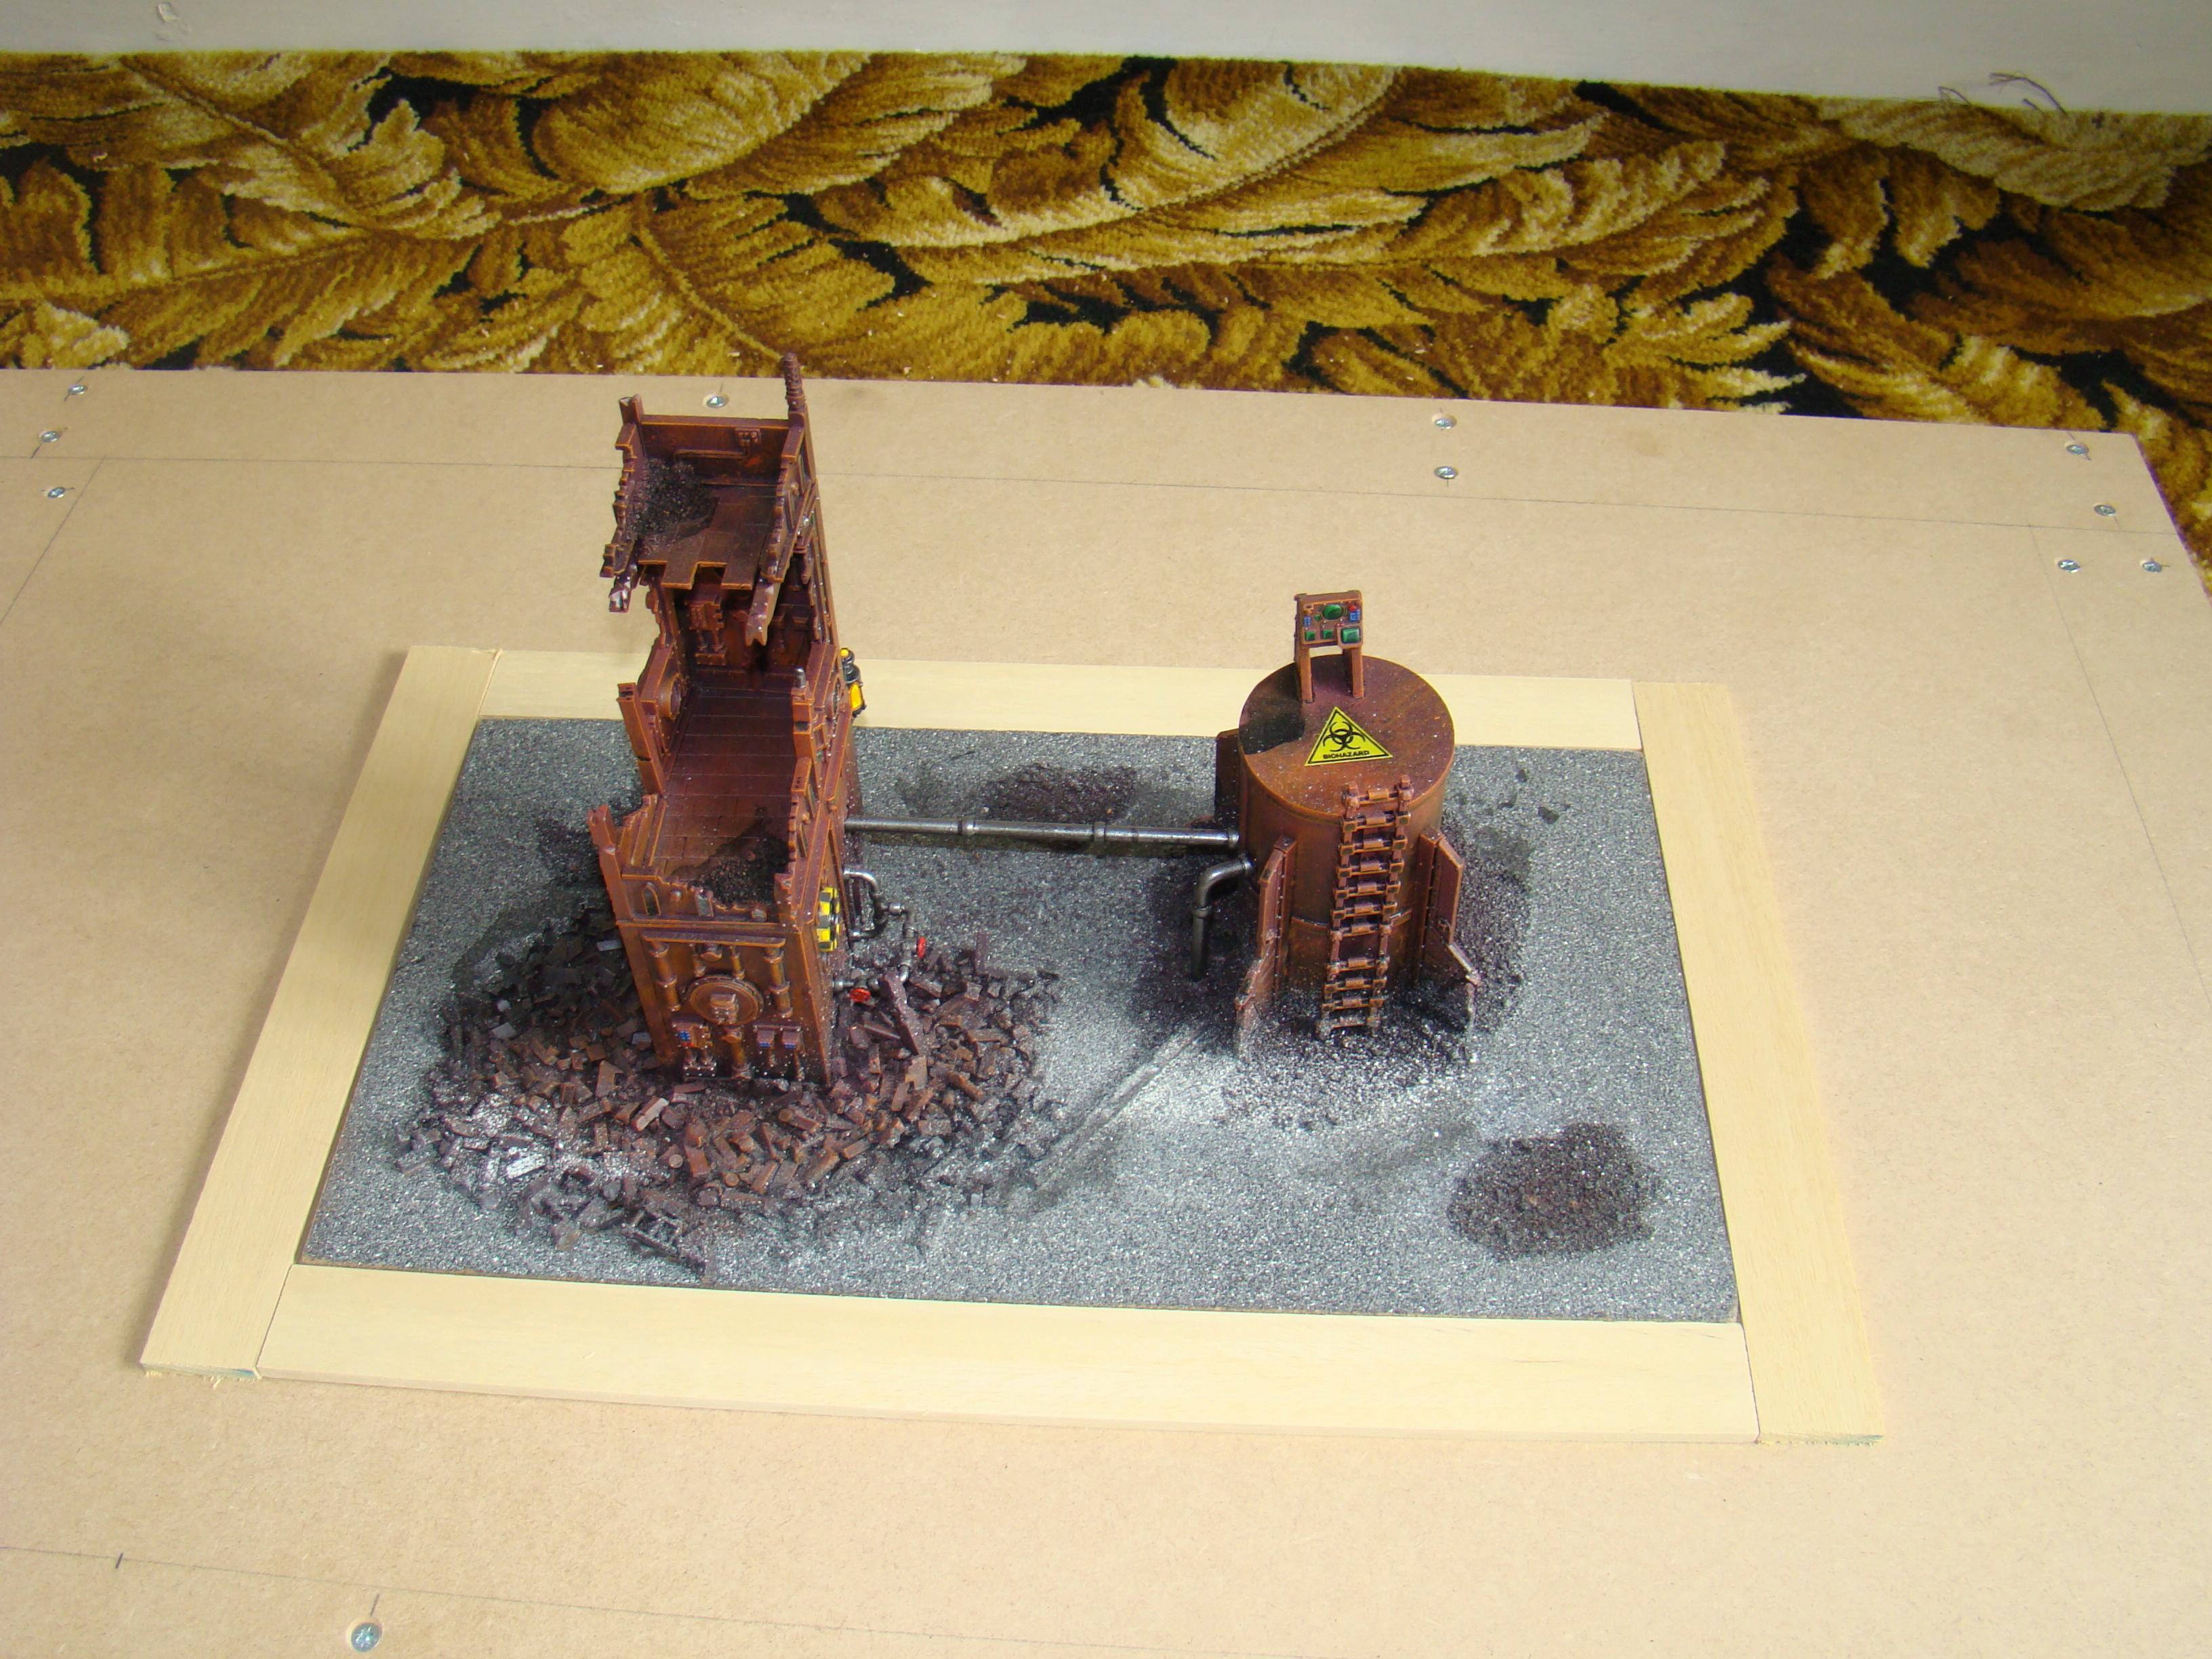 Game Table, Terrain